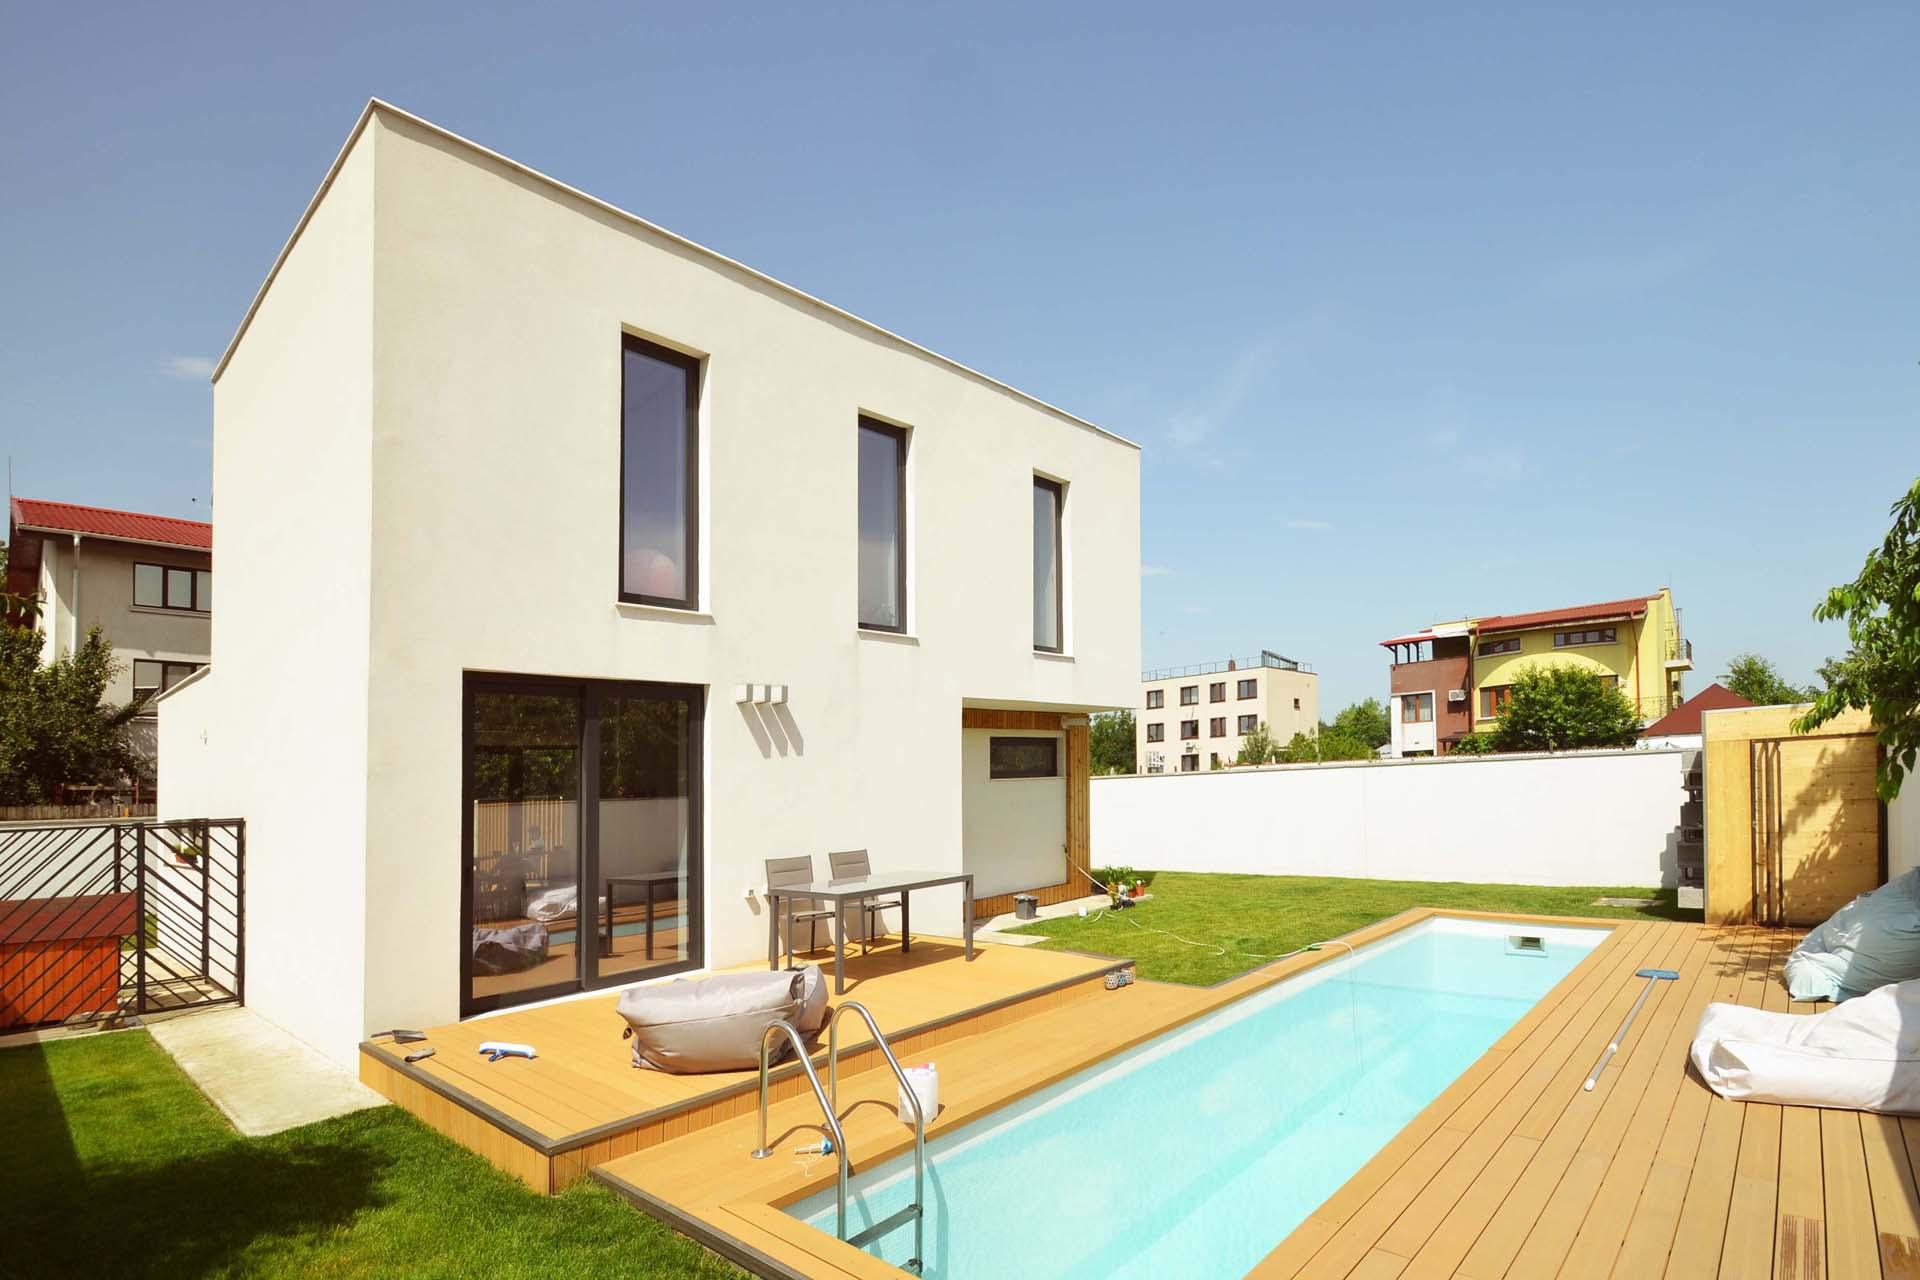 locuinta ytong50cm + piscina (5)